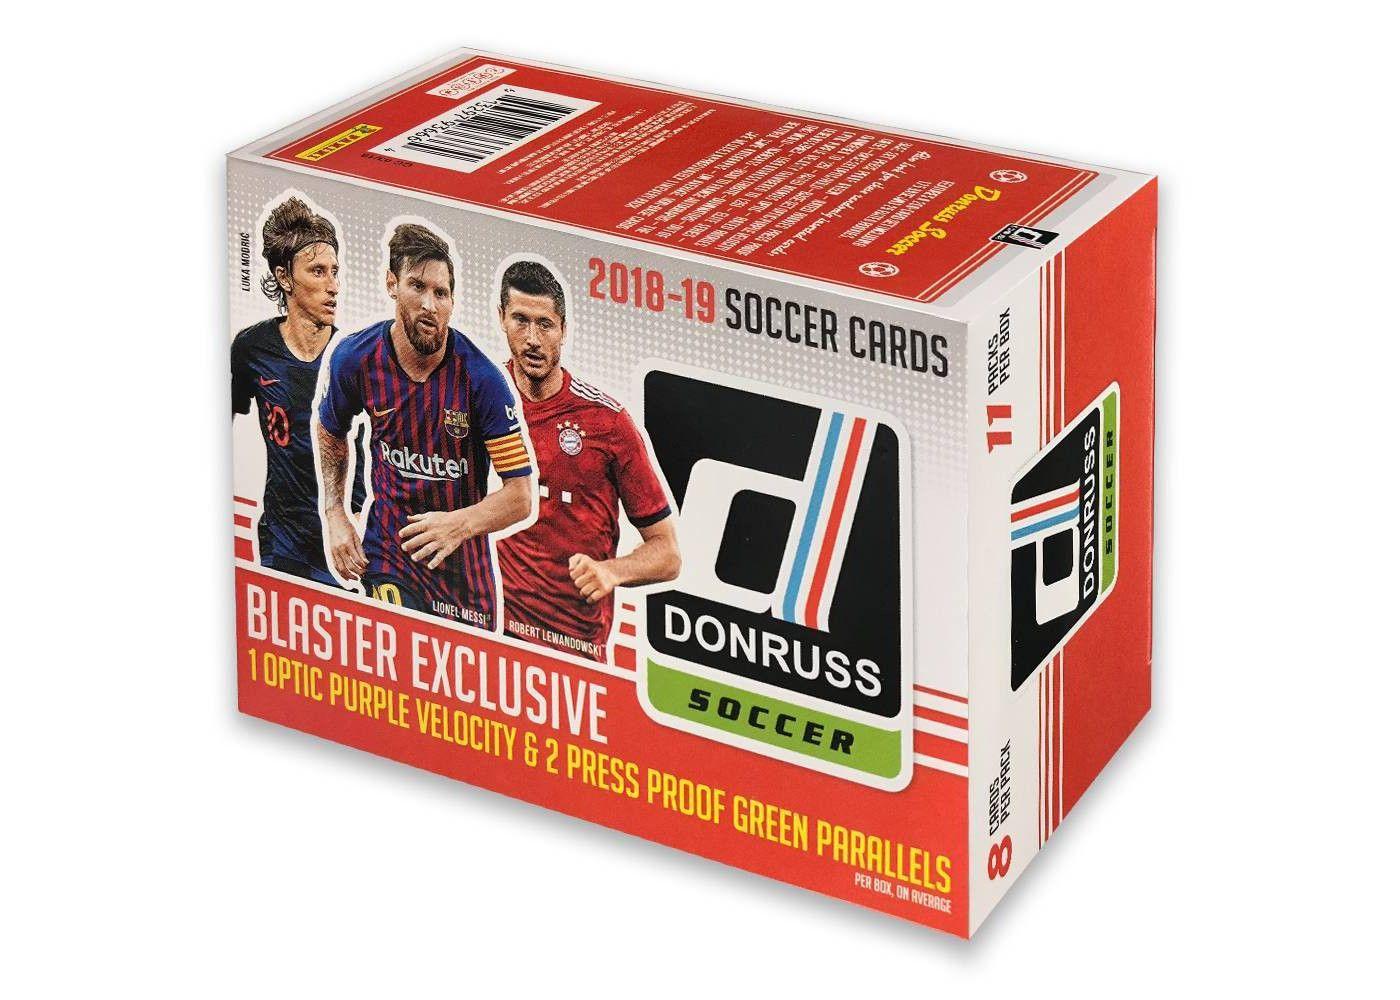 2018 19 Excell Donruss Soccer Trading Card Blaster Box Affiliate Excell Ad Donruss Soccer Soccer Cards Trading Cards Soccer